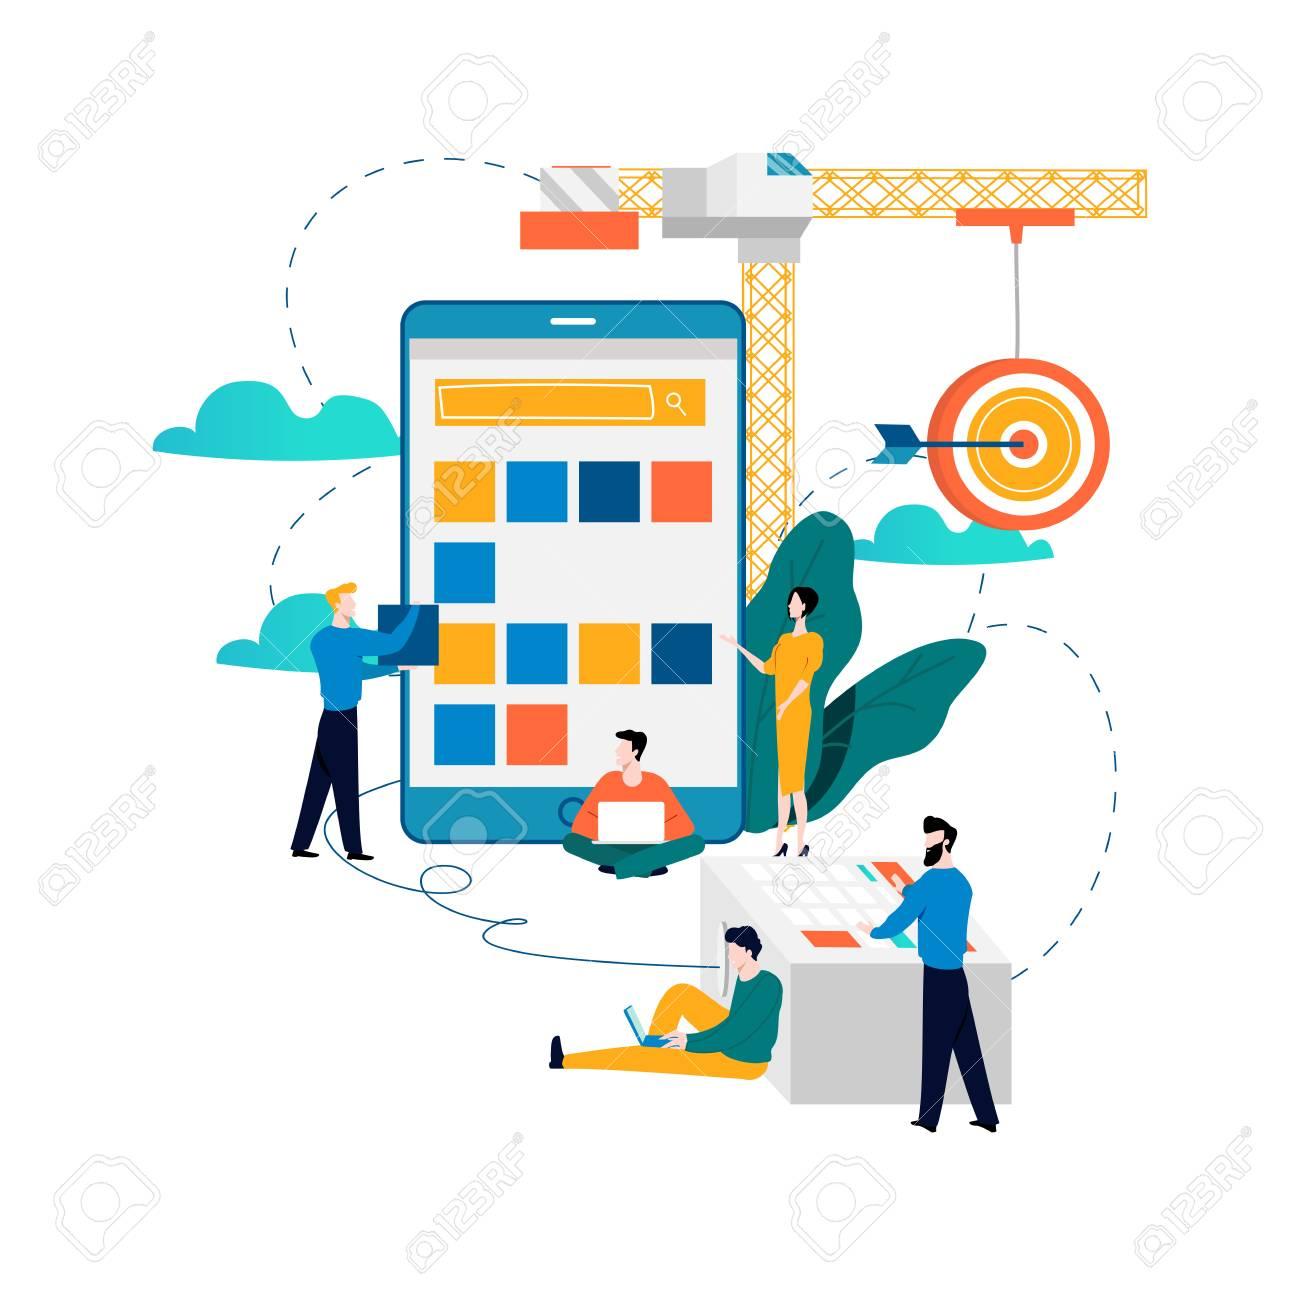 Mobile application development process flat vector illustration. - 92888056